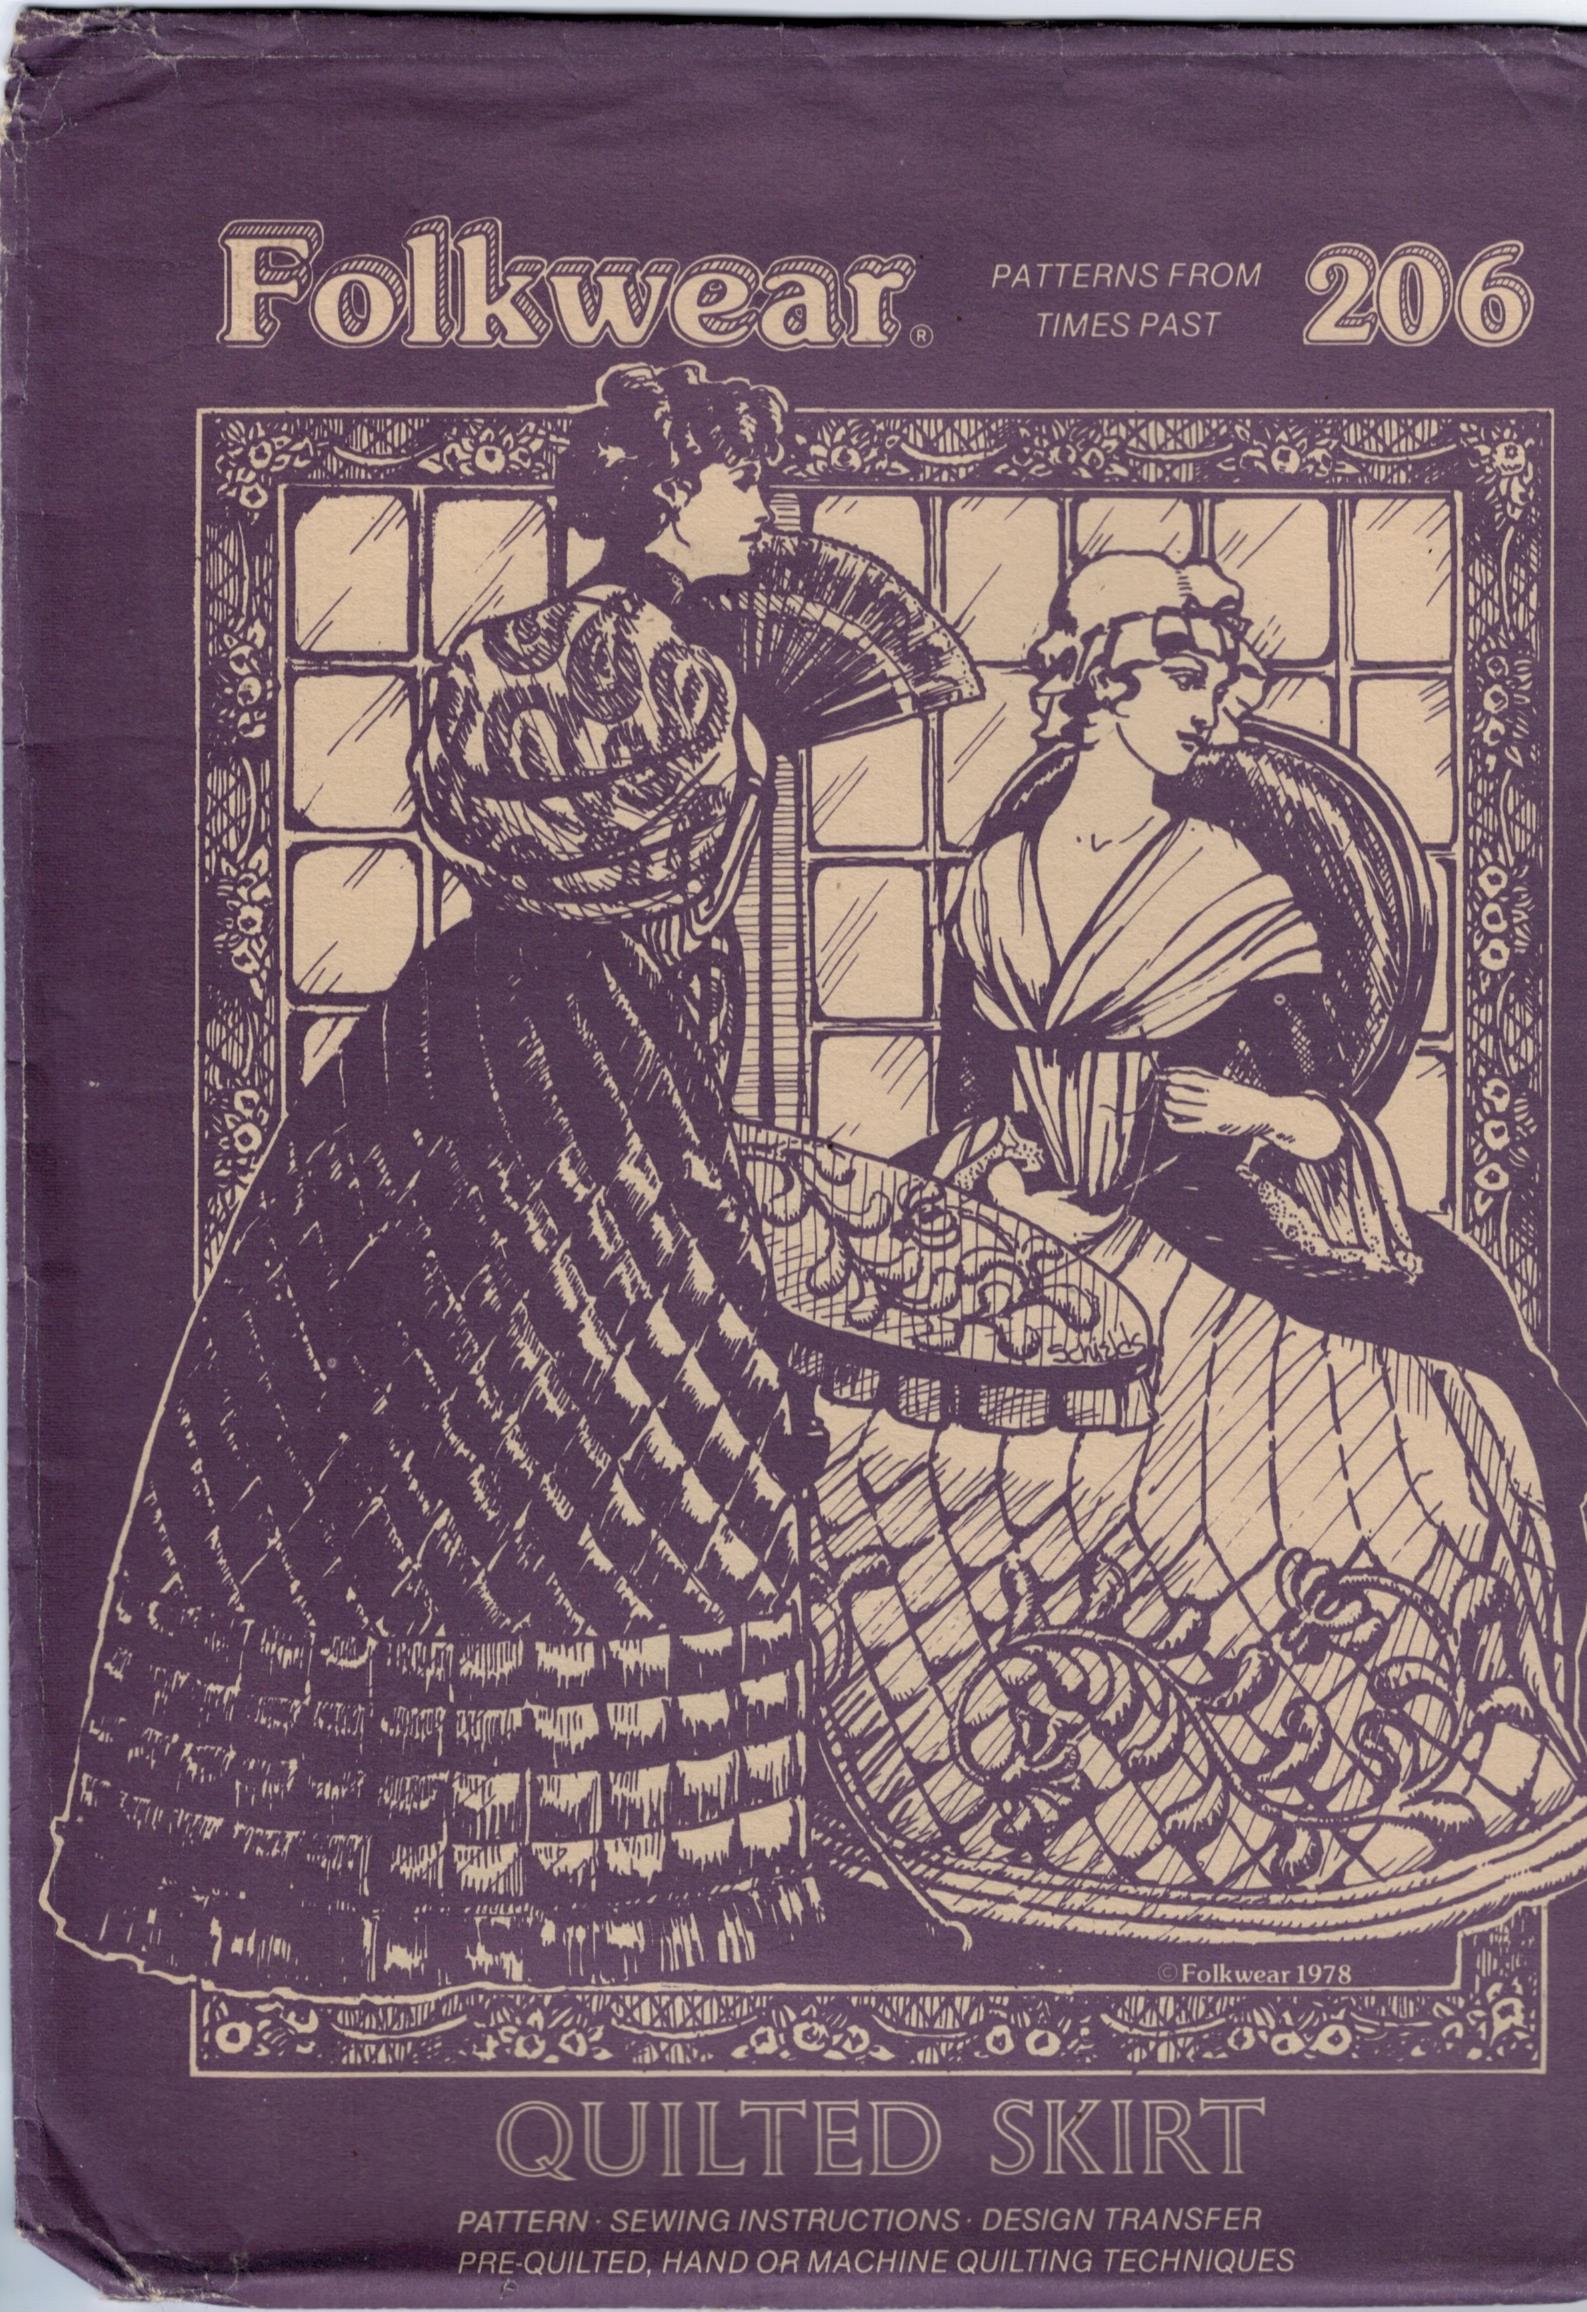 Folkwear Patterns 206 Quilted Skirt 18th Century Pioneer